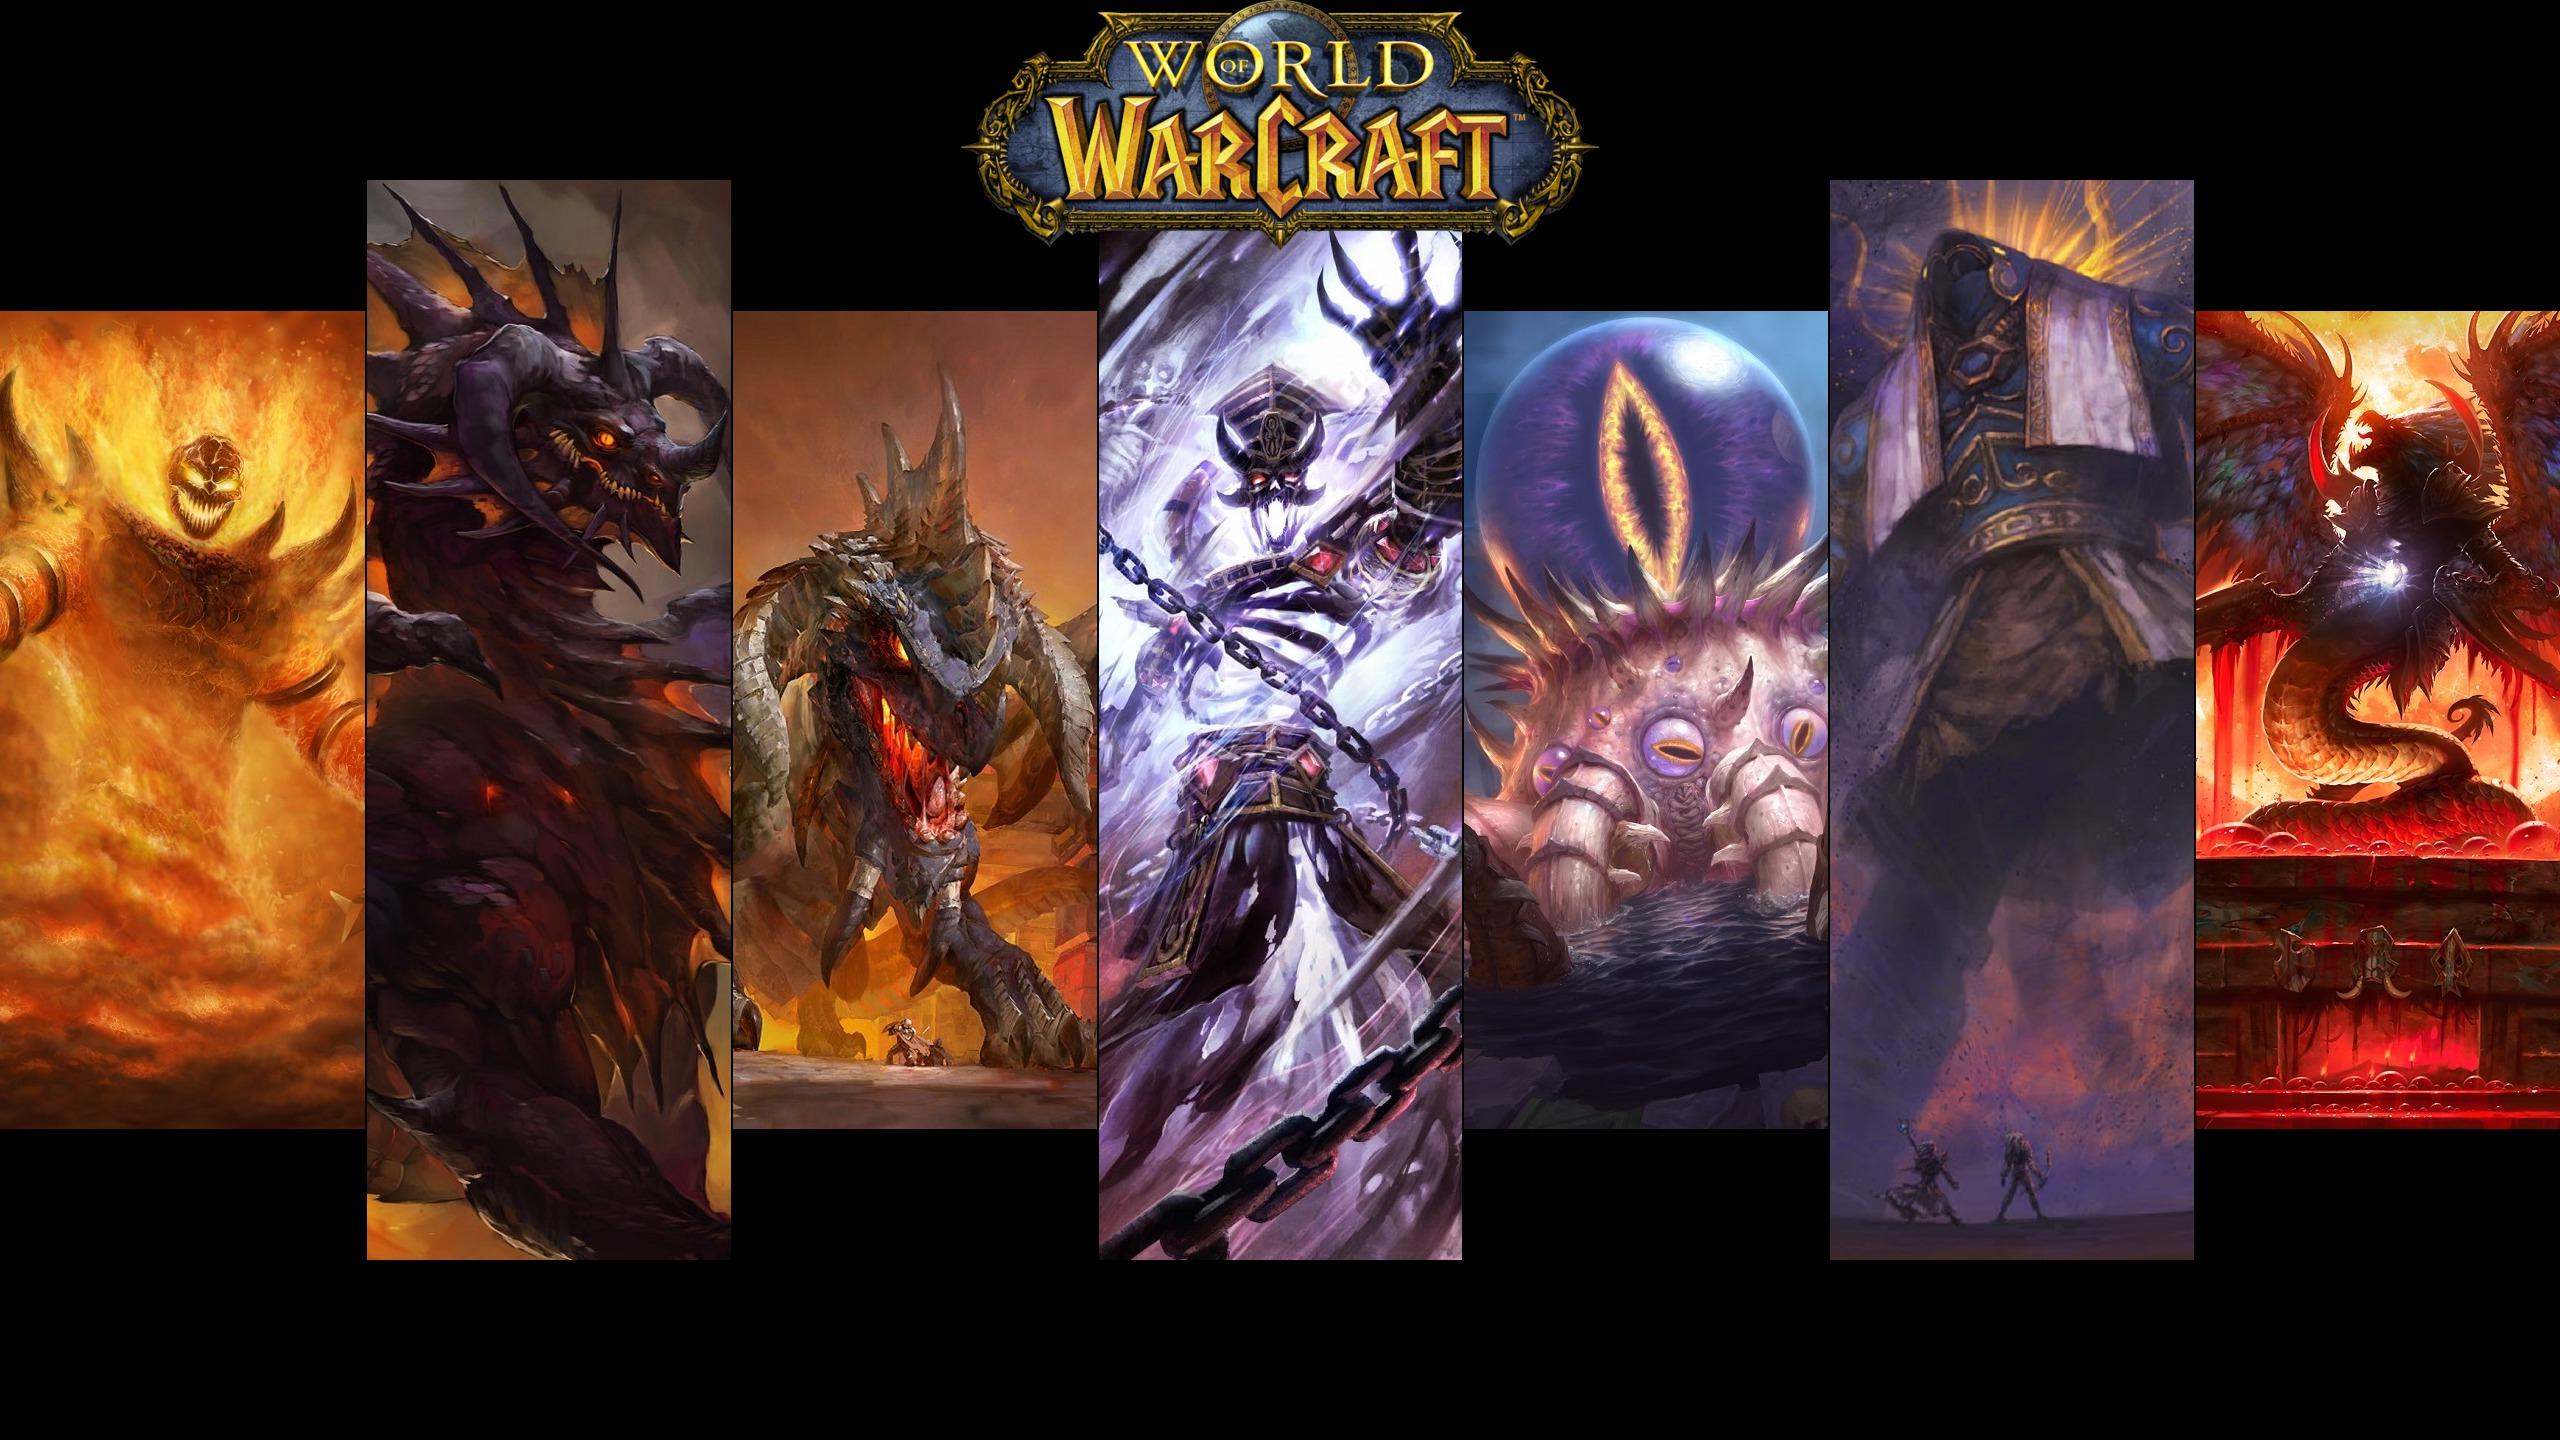 World of Warcraft Classic/Vanilla 2560x1440 by Nedelon on